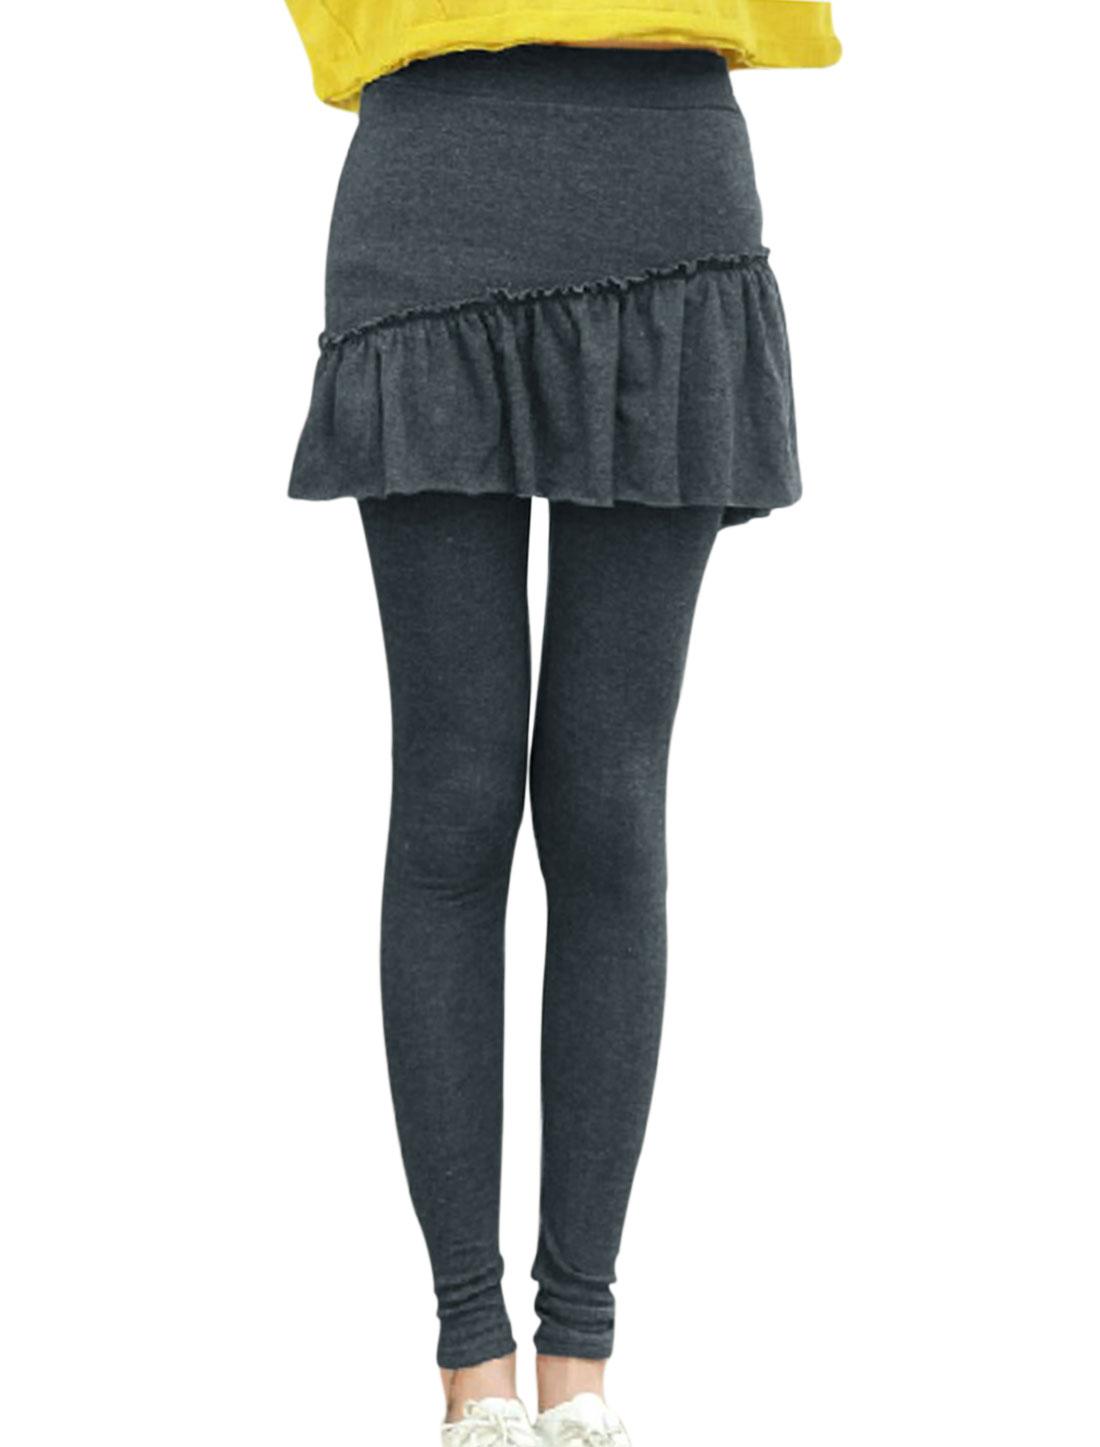 Ladies Ruffled Detail Form-fitting Dark Gray Skirt Leggings XS